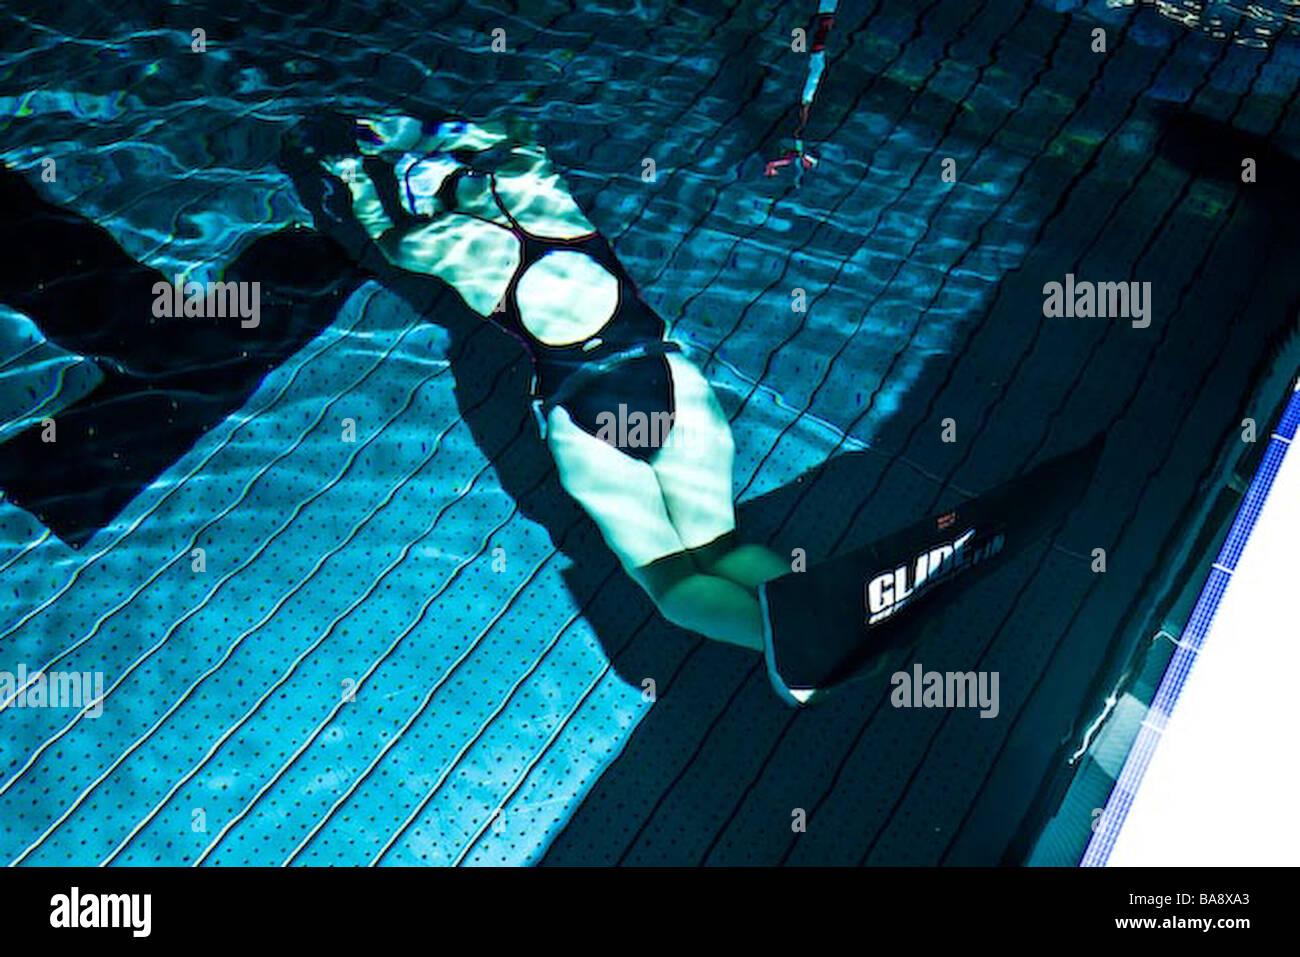 woman diving apnea in a swimming pool Stock Photo: 23553211 - Alamy